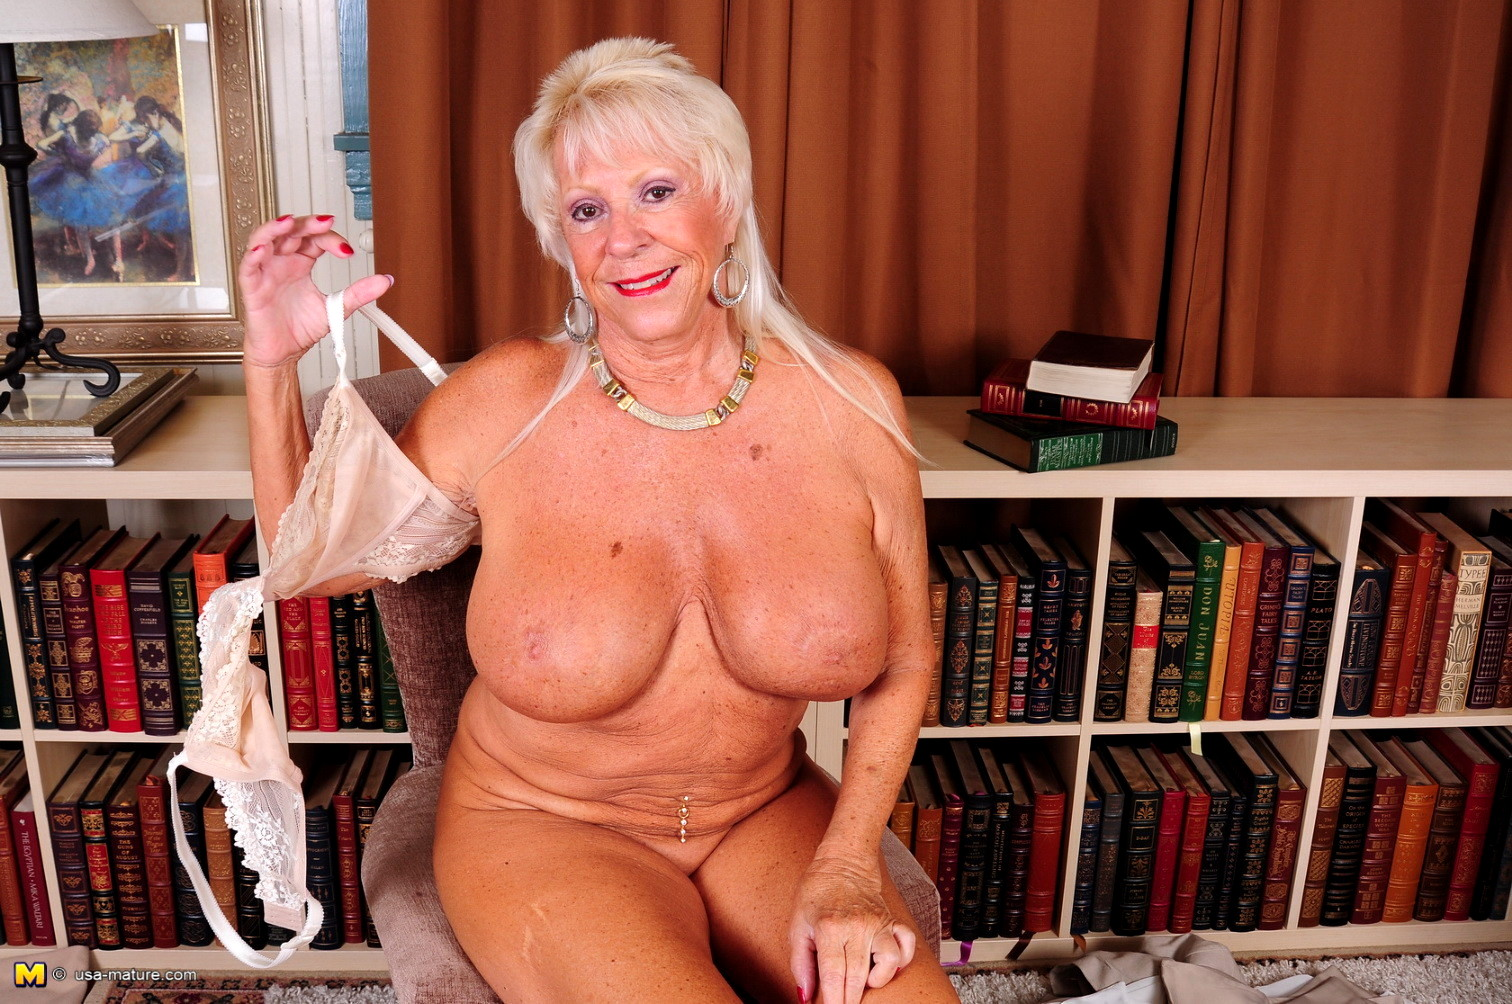 Babe Today Mature Nl Mandi Mcgraw Crazy Big Tits Xxxart -1288